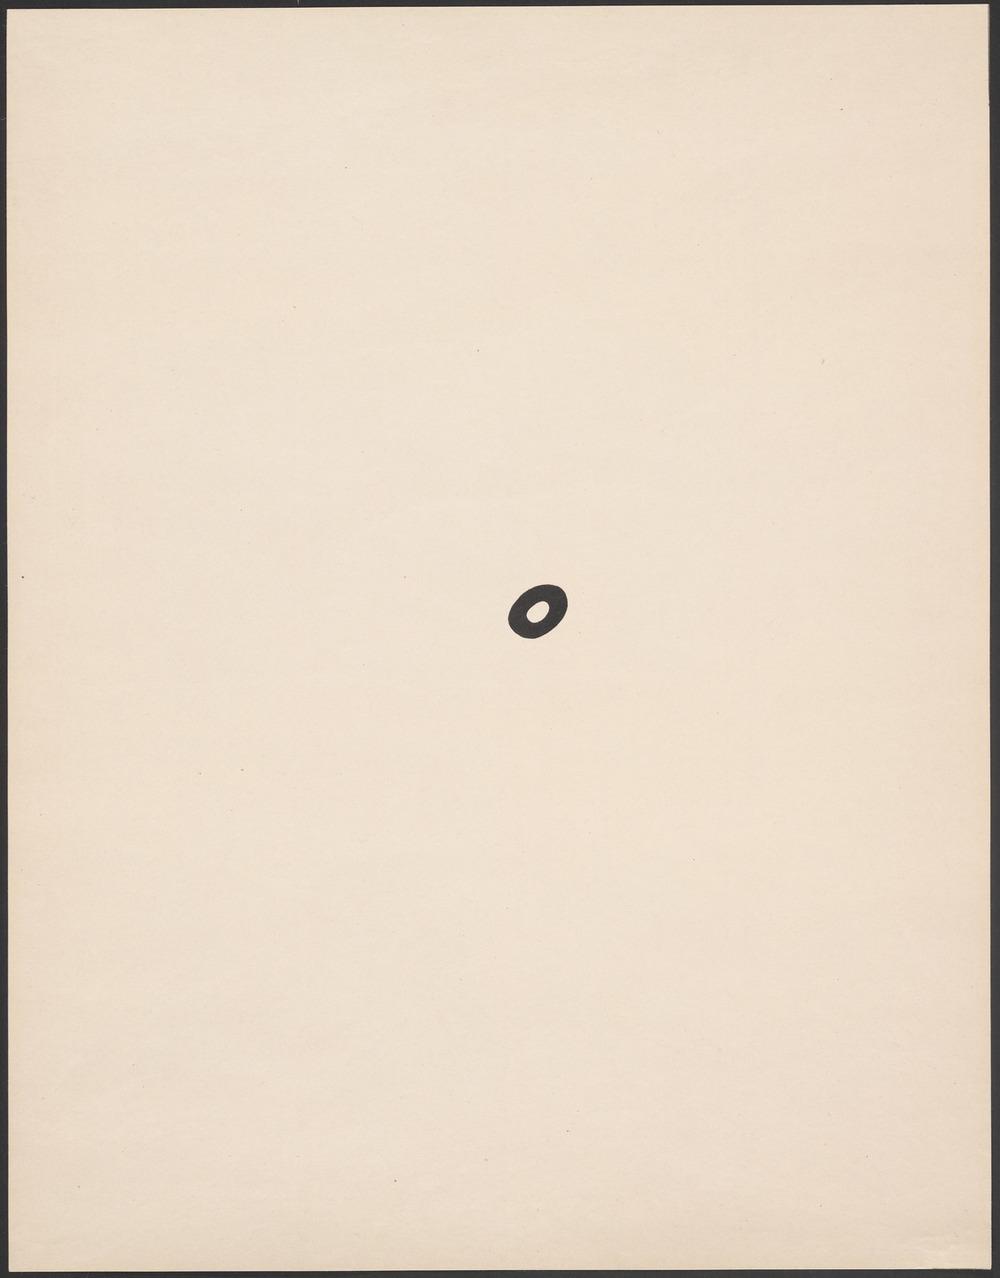 Jean (Hans) Arp,  A Navel , 1923, Museum of Modern Art, New York.